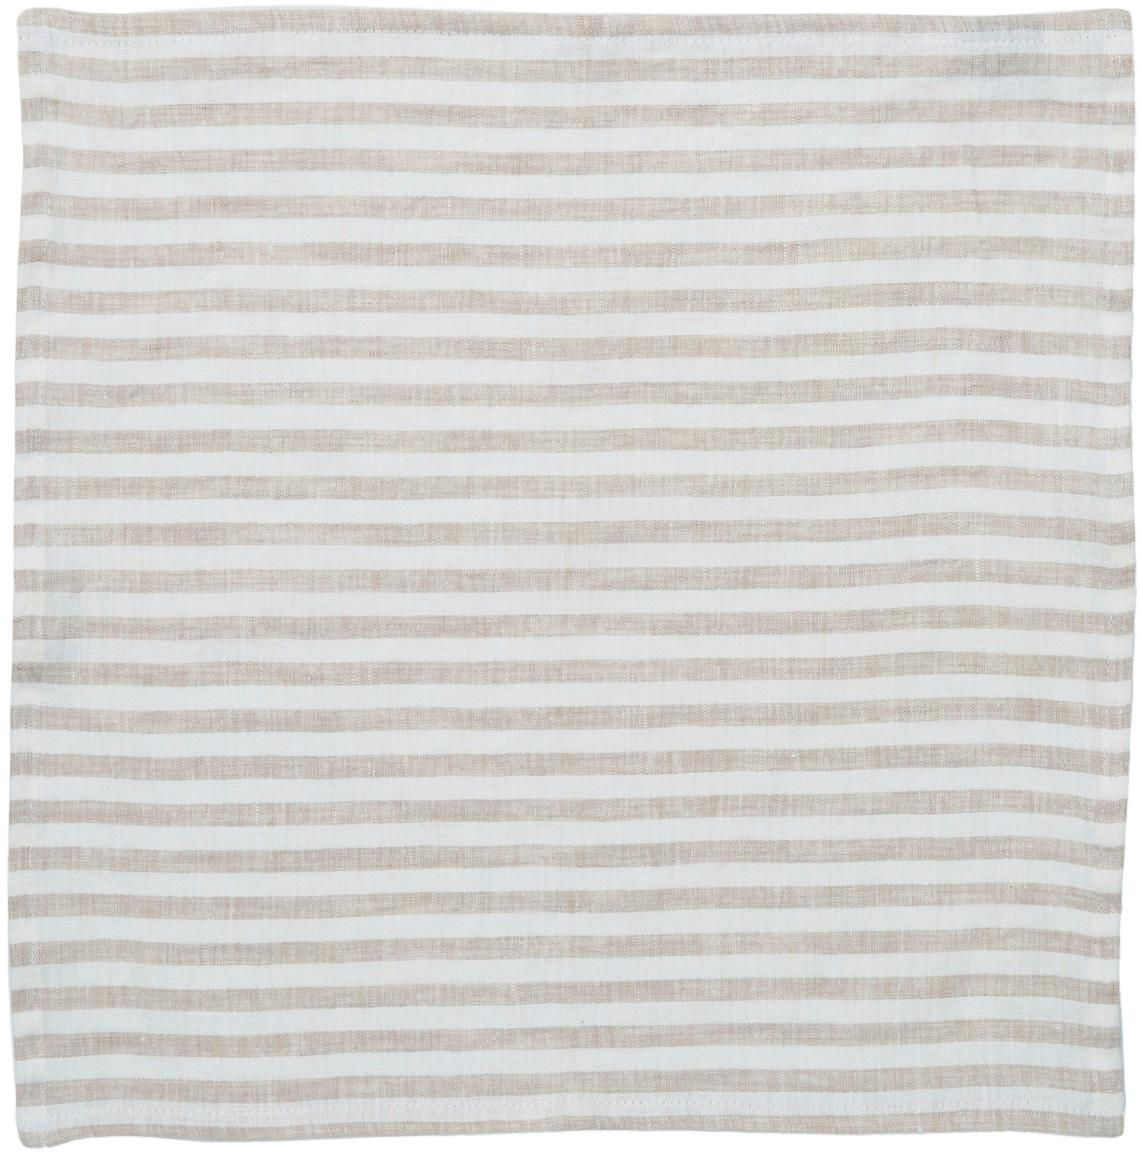 Leinen-Servietten Solami, 6 Stück, Leinen, Beige, Weiss, 46 x 46 cm